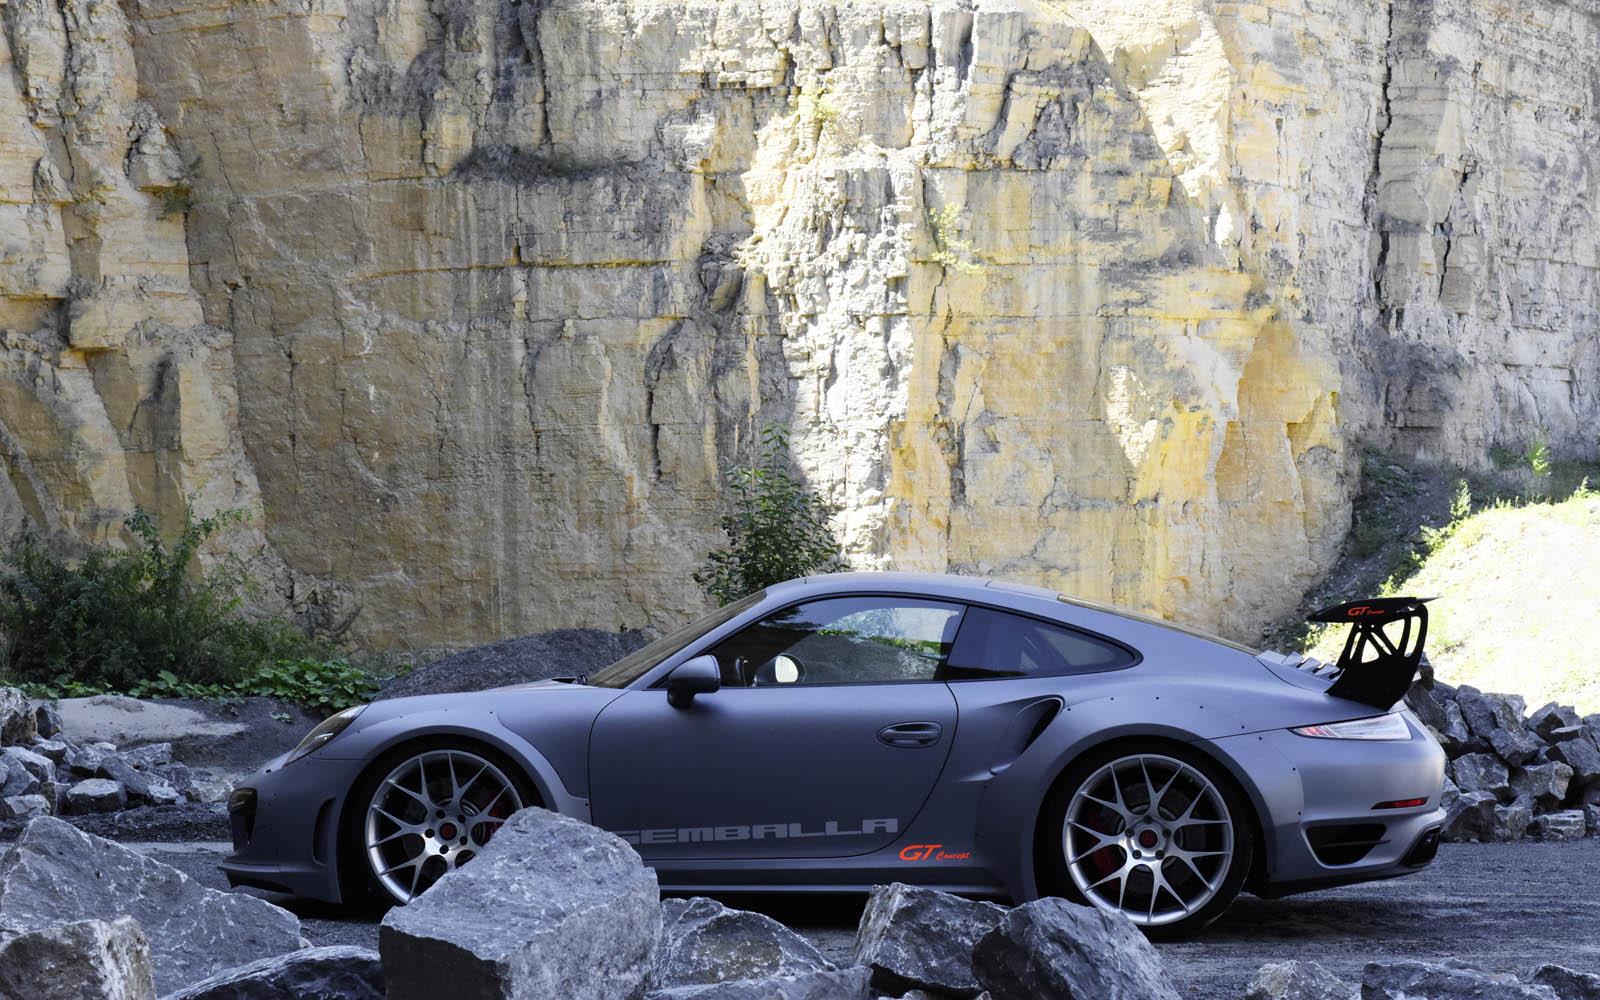 Porsche 911 Turbo GT Concept